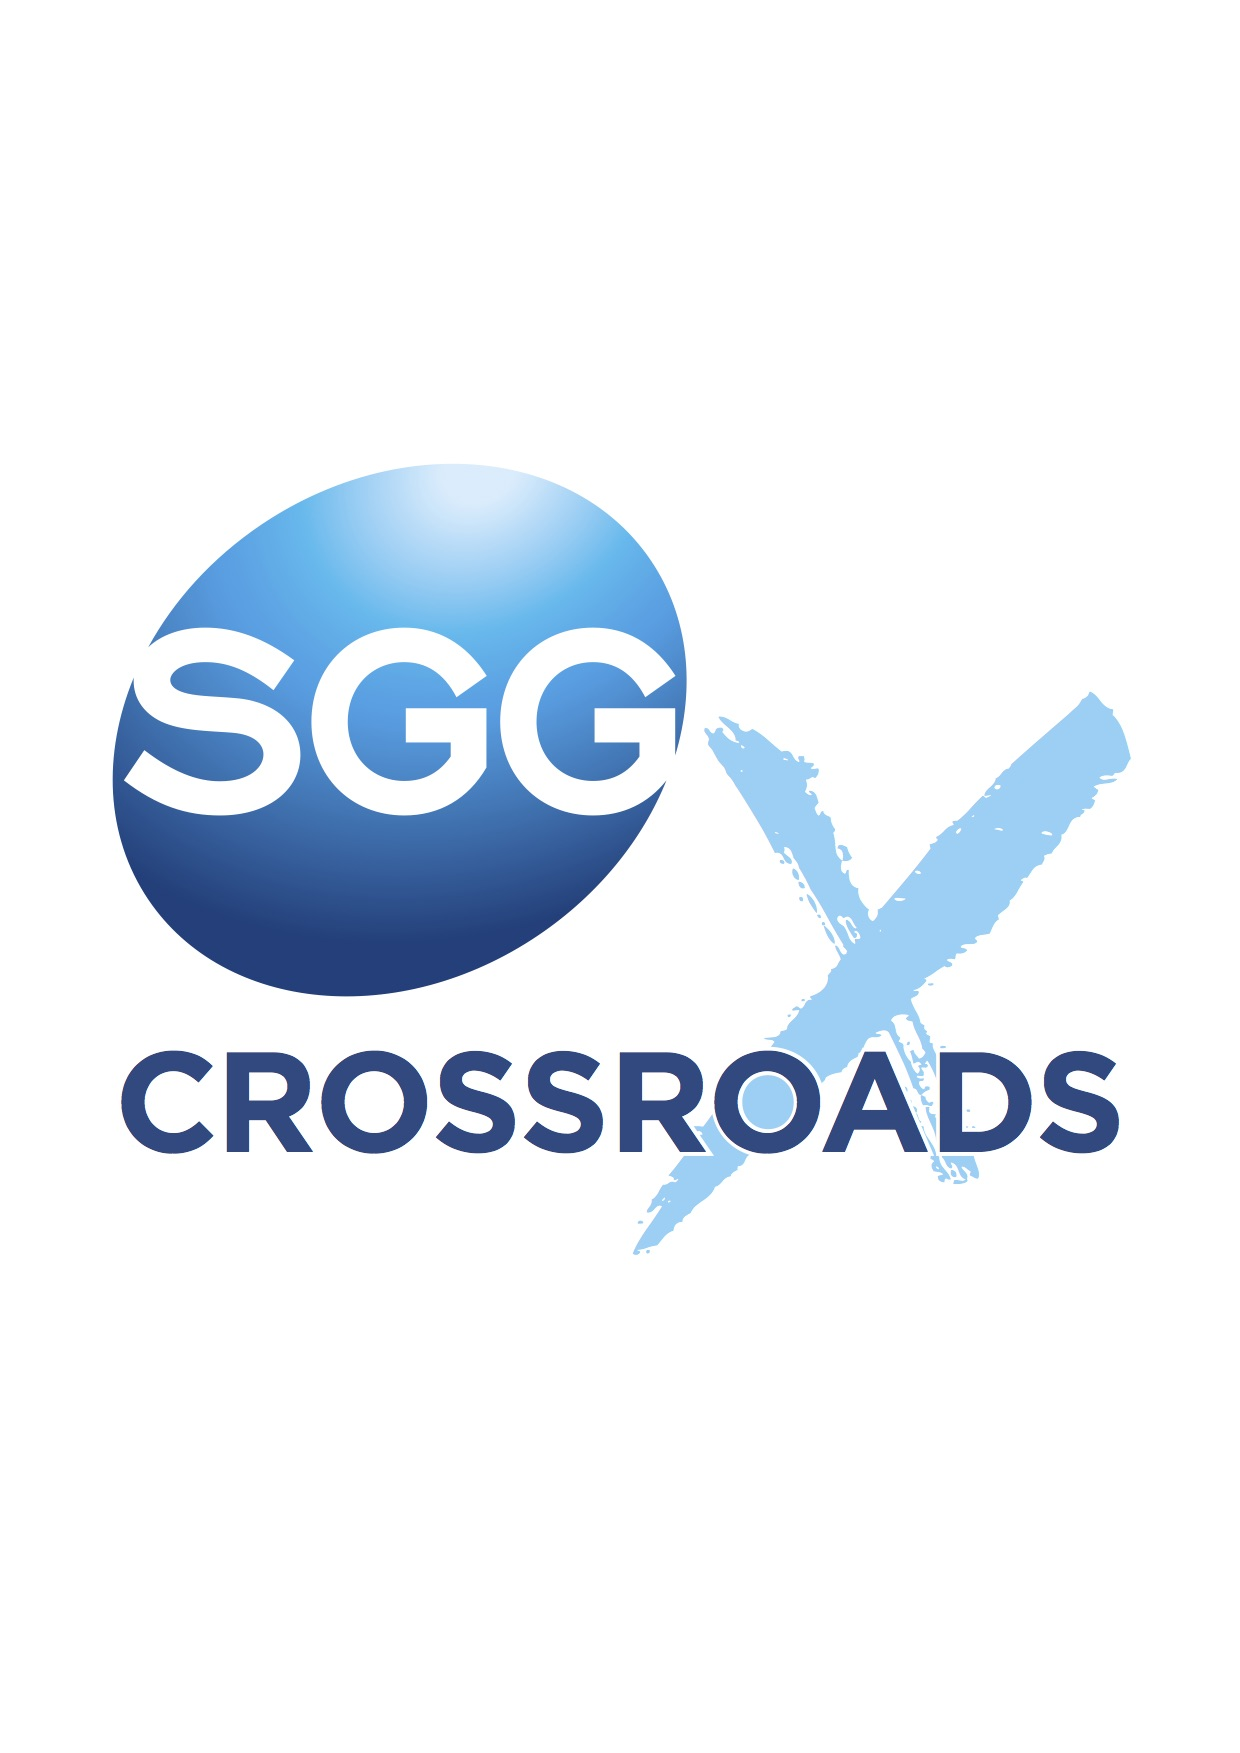 SGG Crossroads